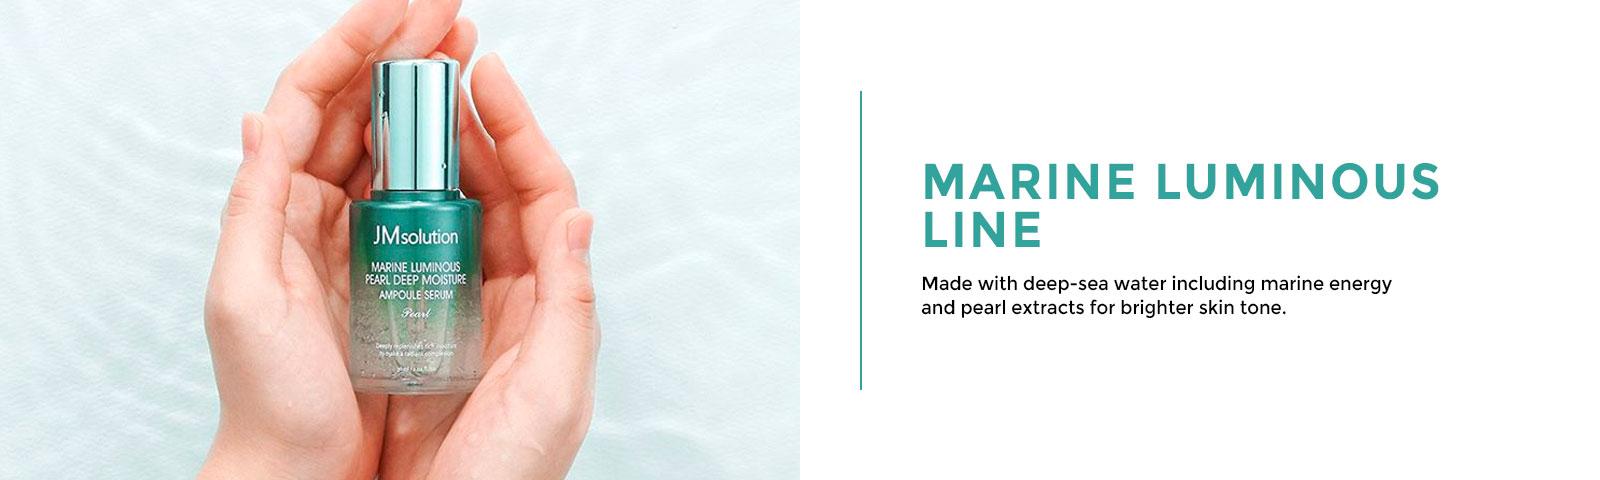 subline banner marine luminous JMsolution